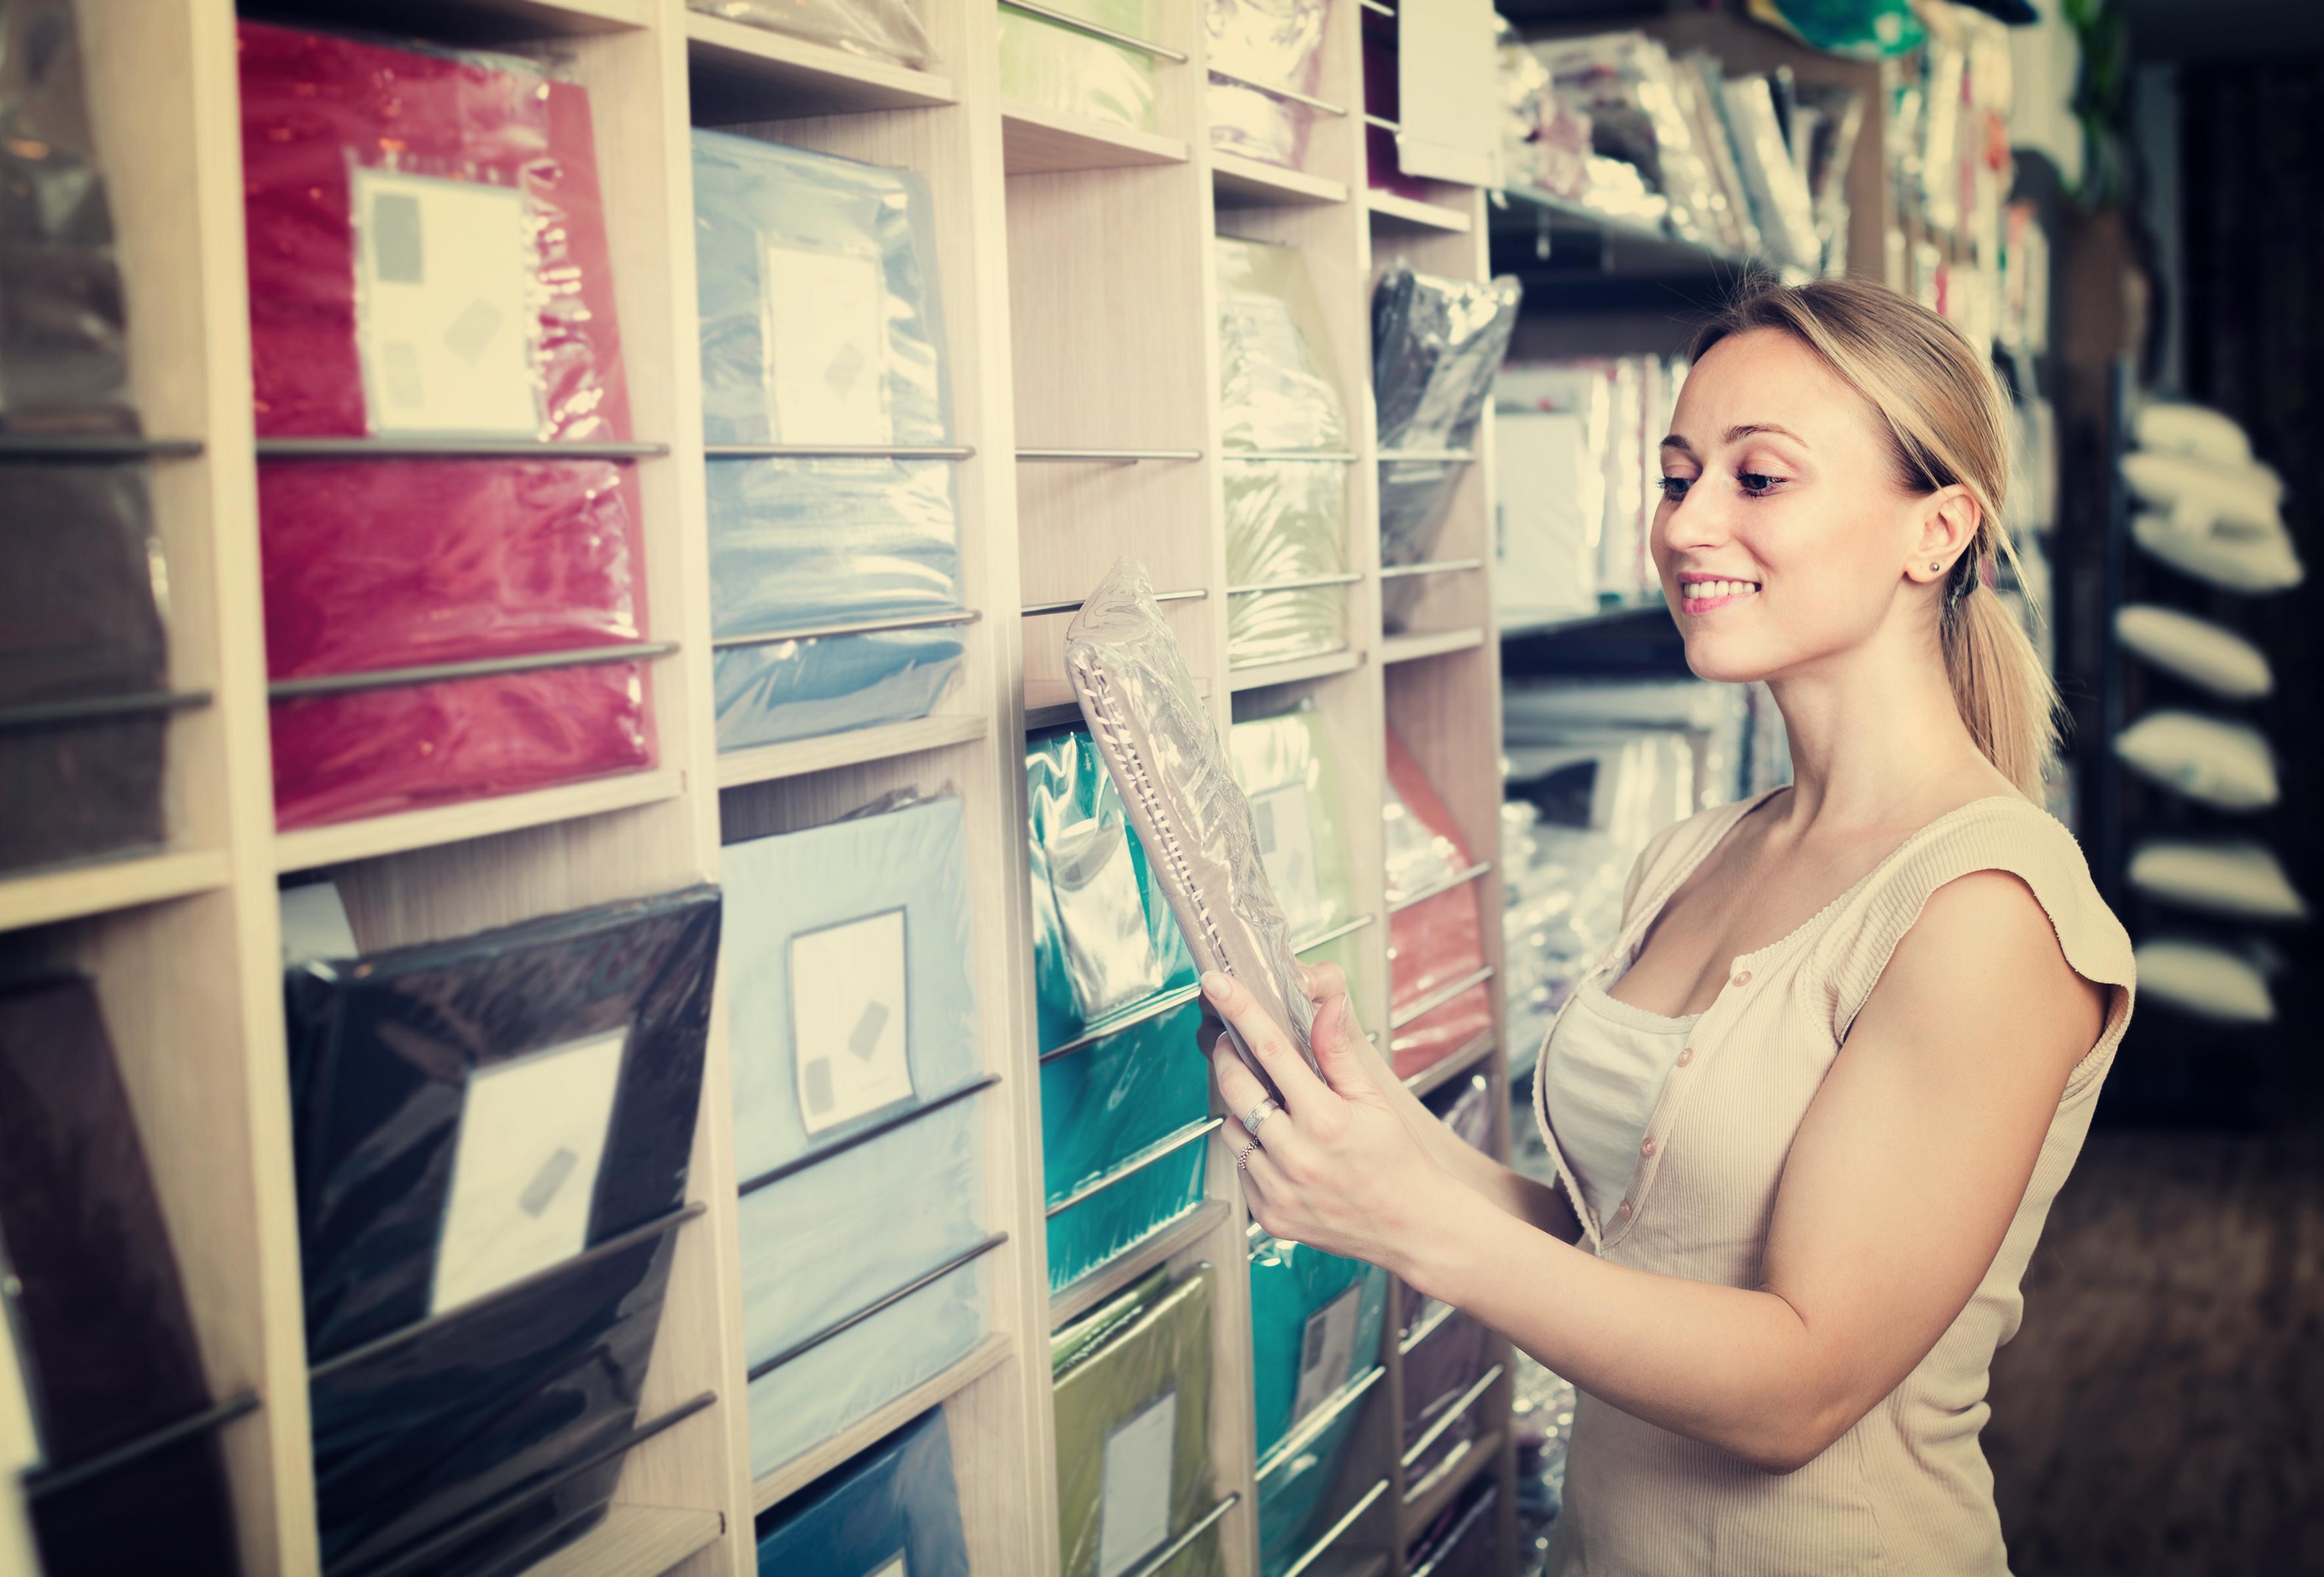 Woman looking at bedding display